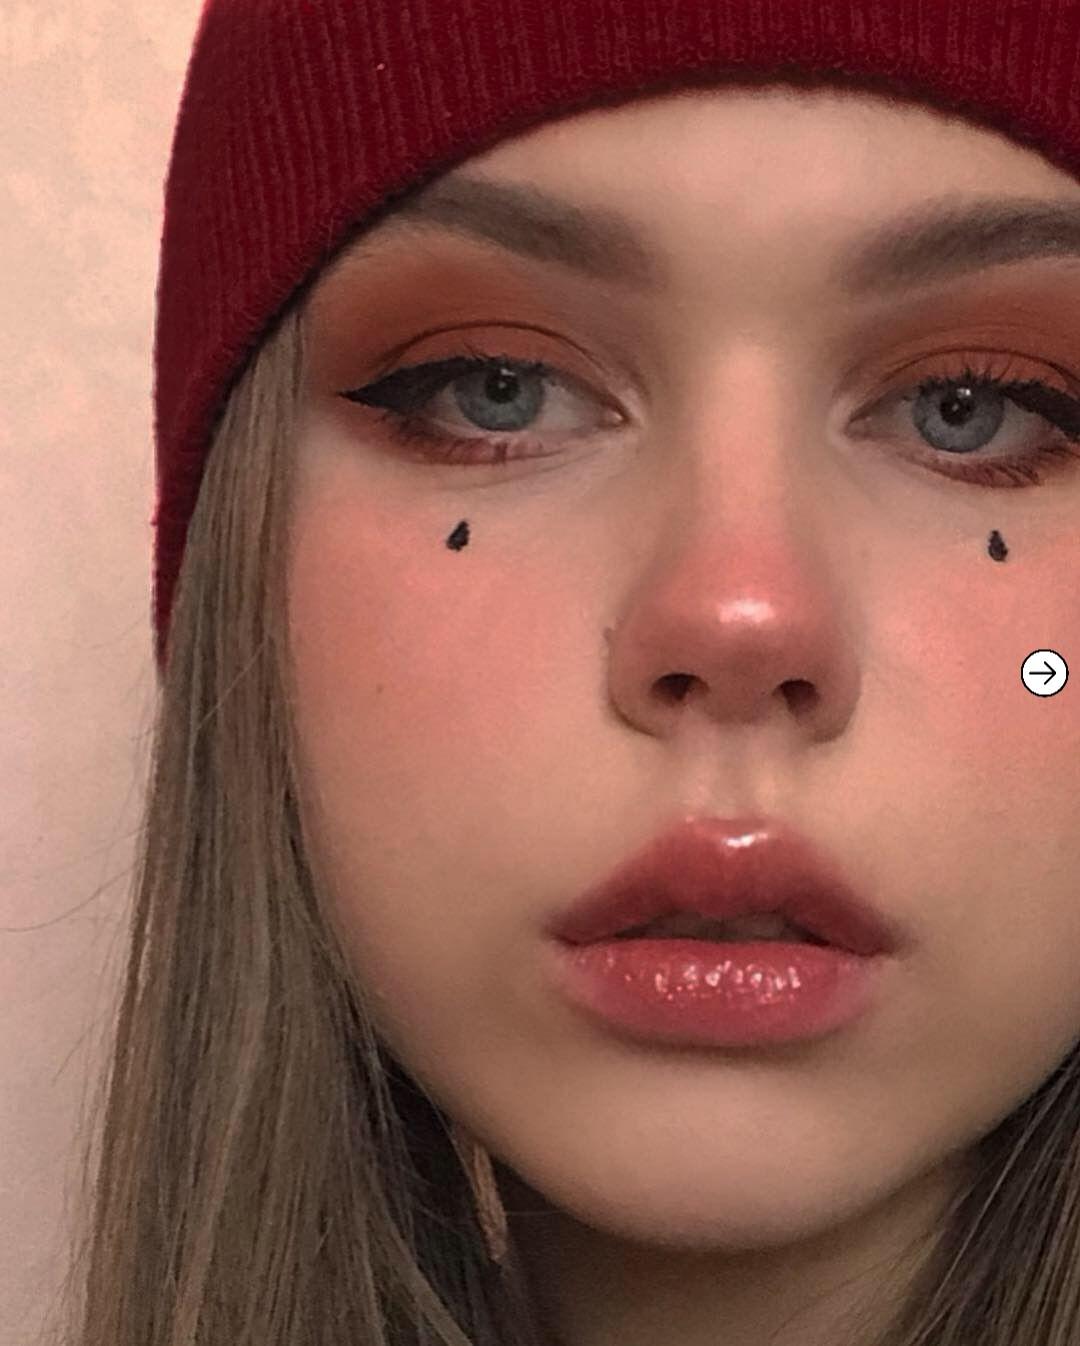 10 Egirl makeup inspiration that are trending right now 7